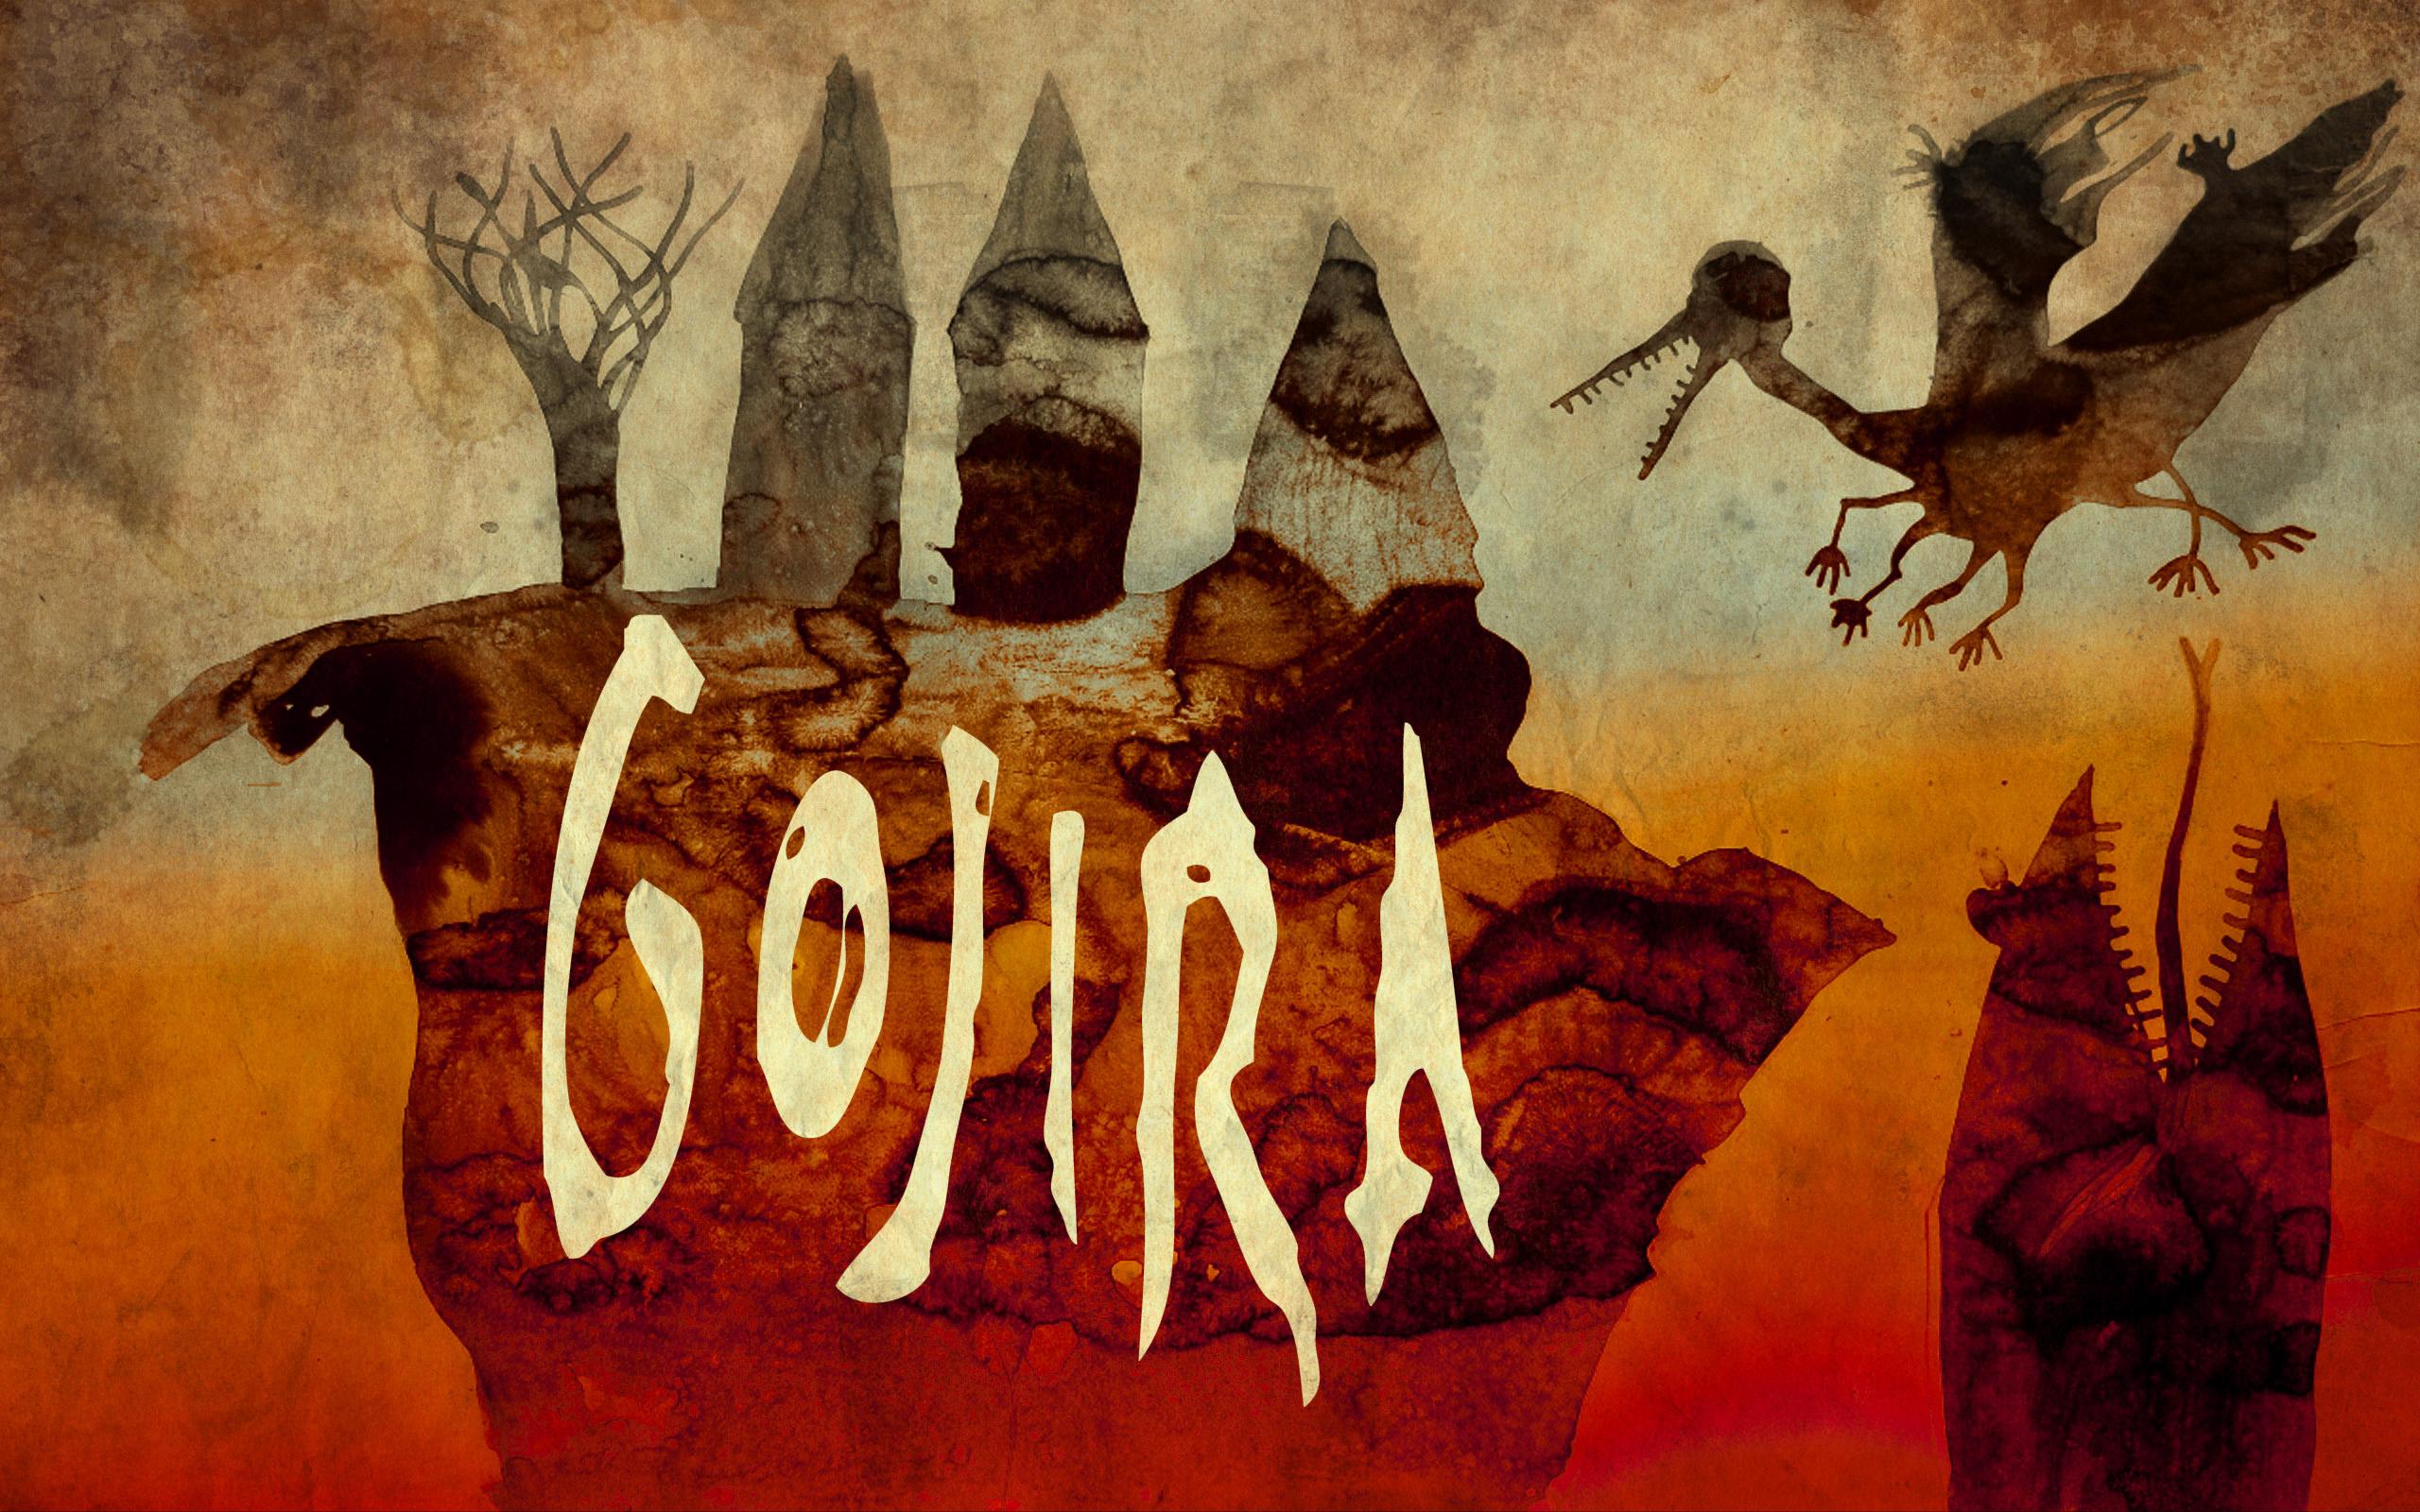 Gojira HD Wallpaper Background Image 2560x1600 ID235260 2560x1600